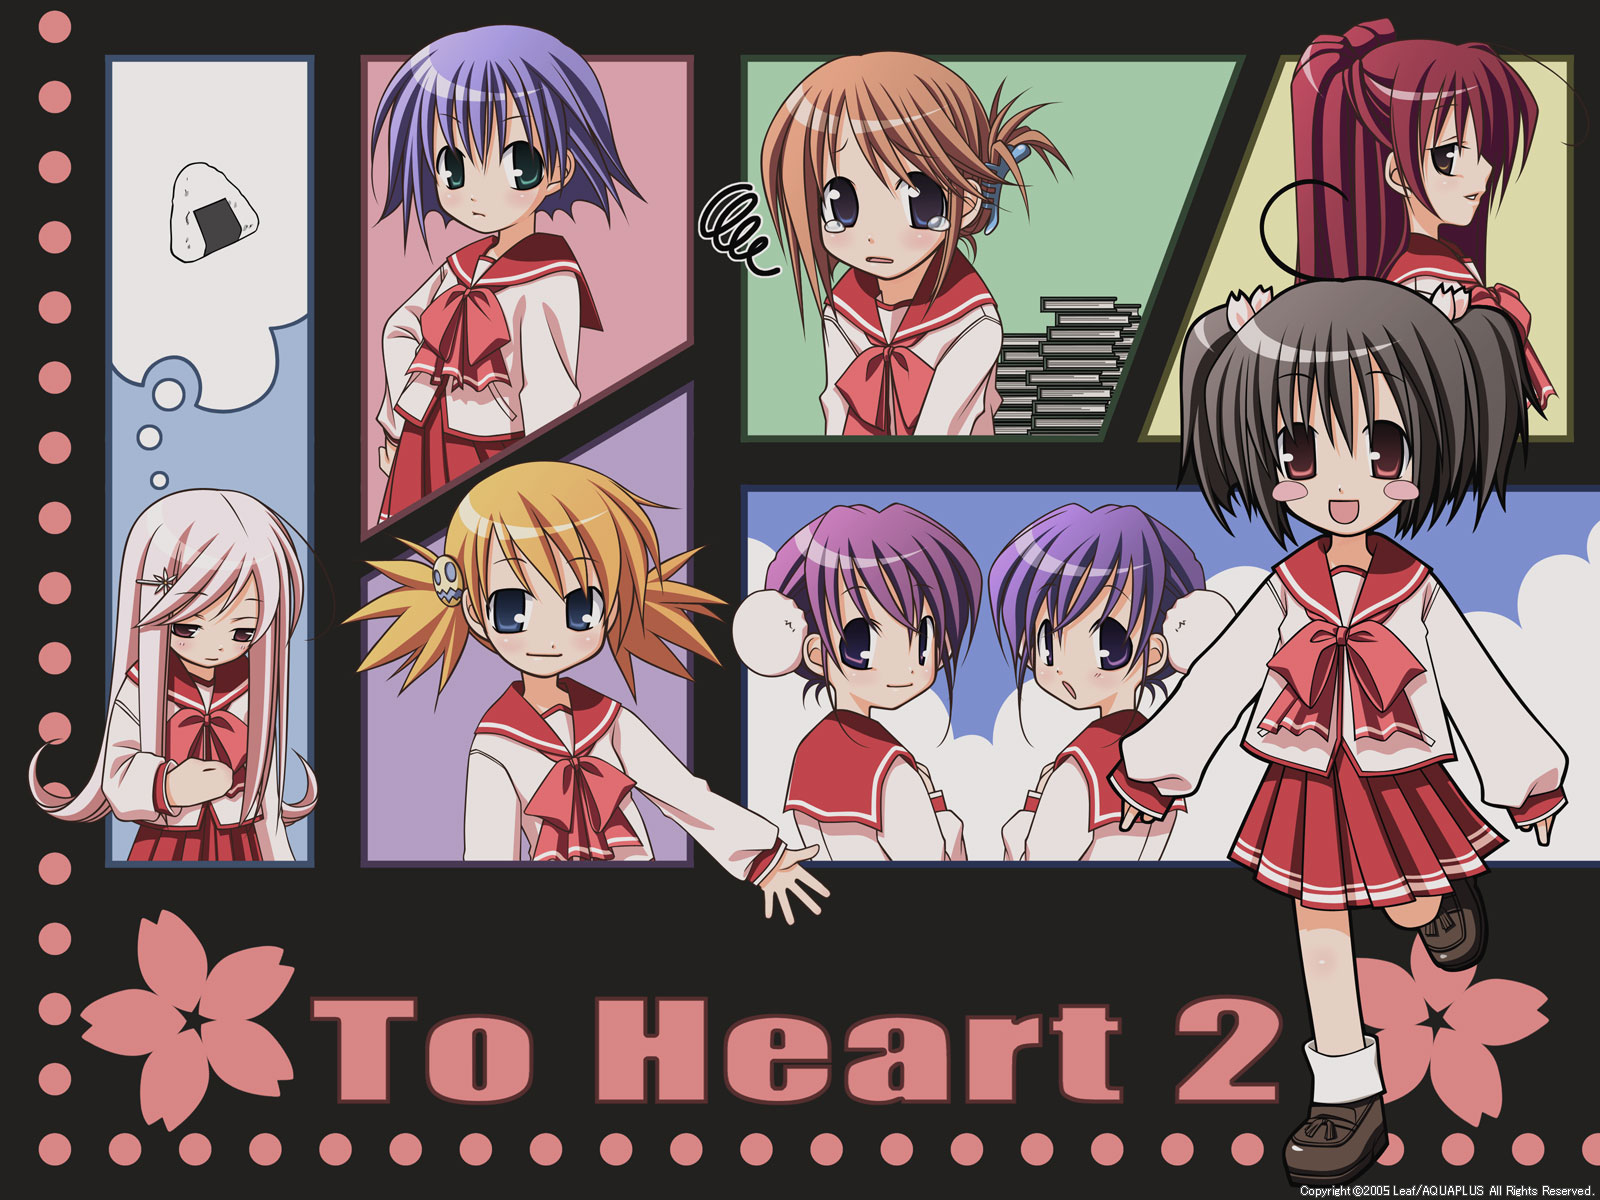 aquaplus chibi himeyuri_ruri himeyuri_sango komaki_manaka kousaka_tamaki leaf lucy_maria_misora sasamori_karin tagme_(artist) to_heart to_heart_2 tonami_yuma yuzuhara_konomi